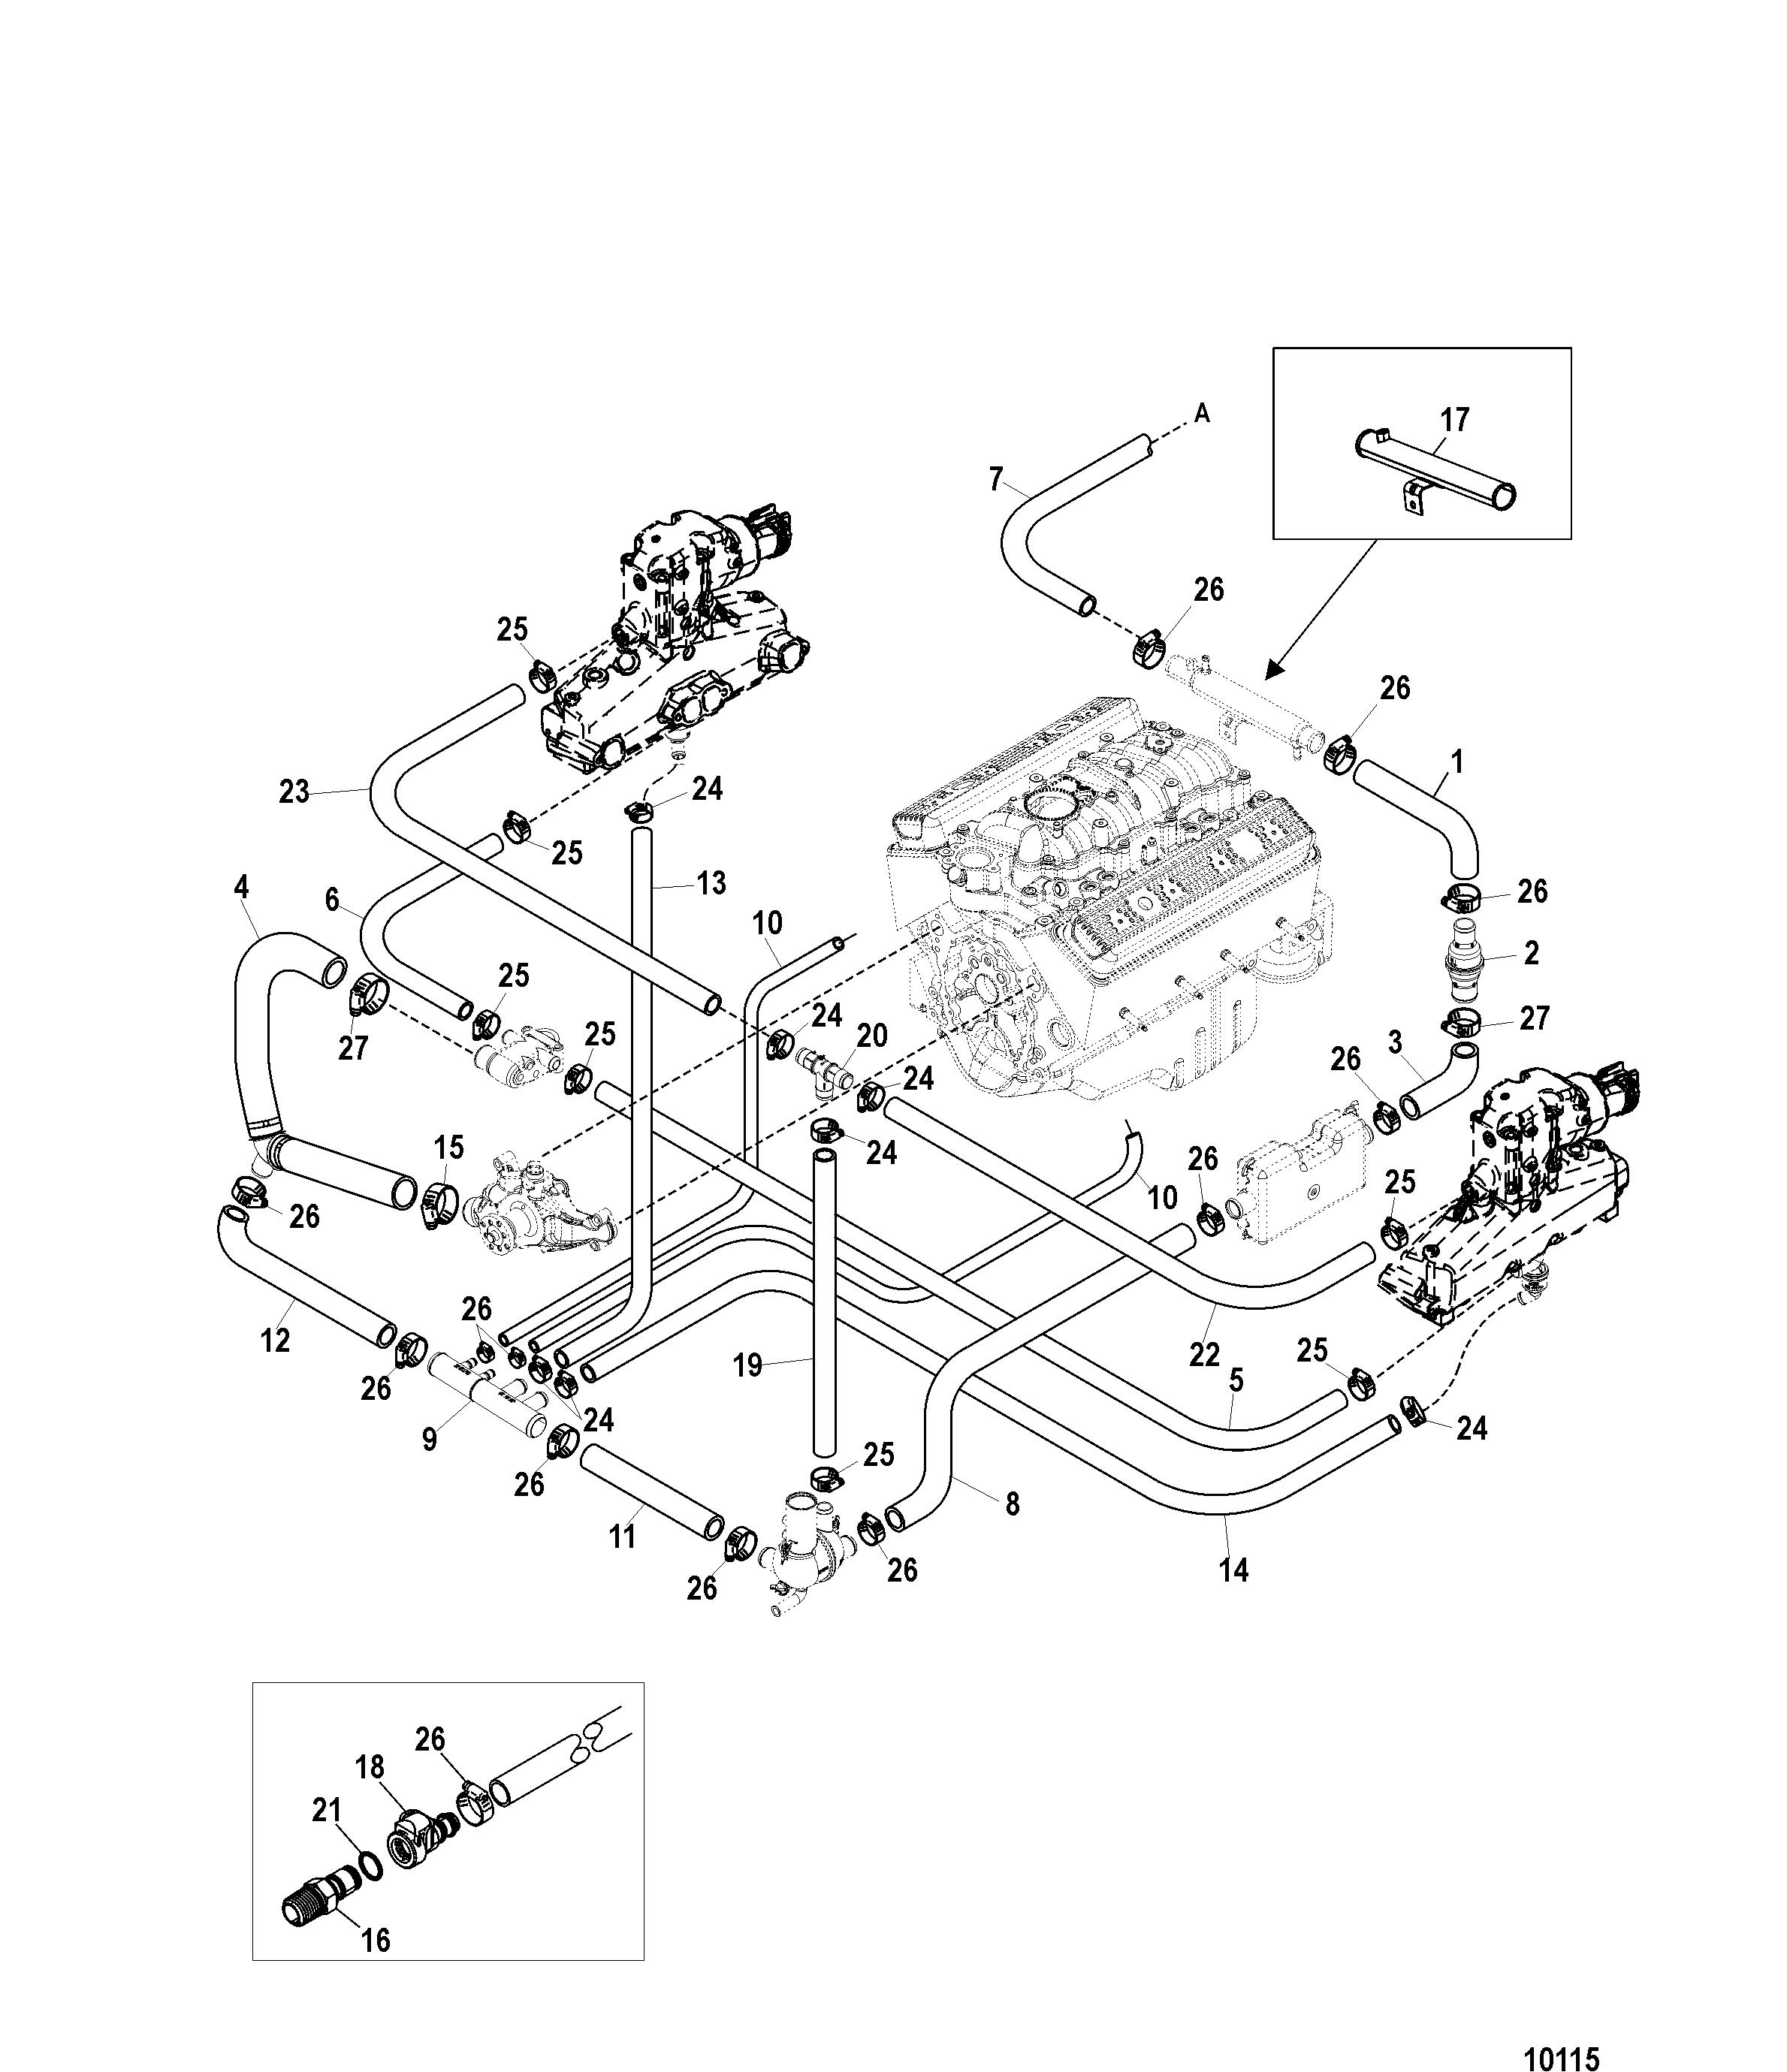 Mercruiser 3 0 Cooling System Diagram